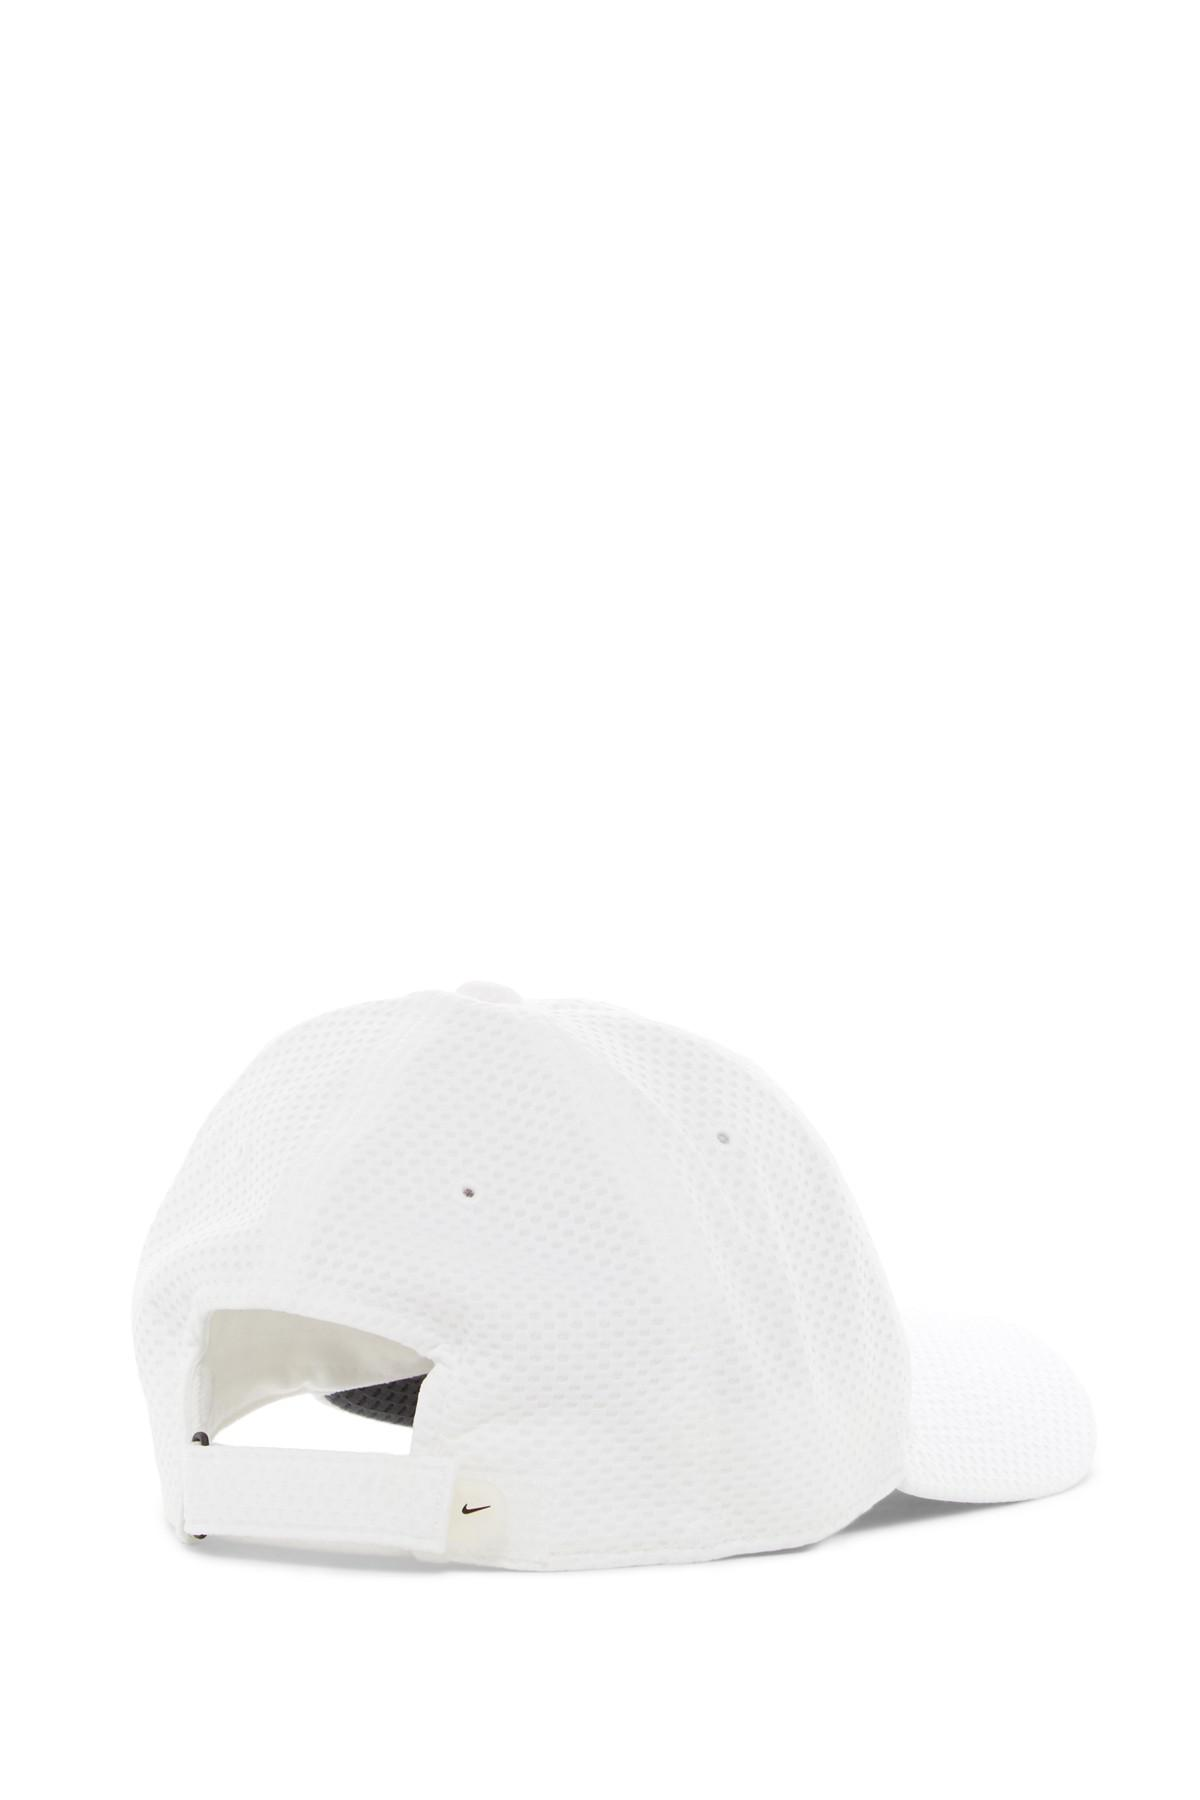 e600f8515a0 ... new zealand lyst nike tailwind 6 panel drifit cap in white for men  68195 448b7